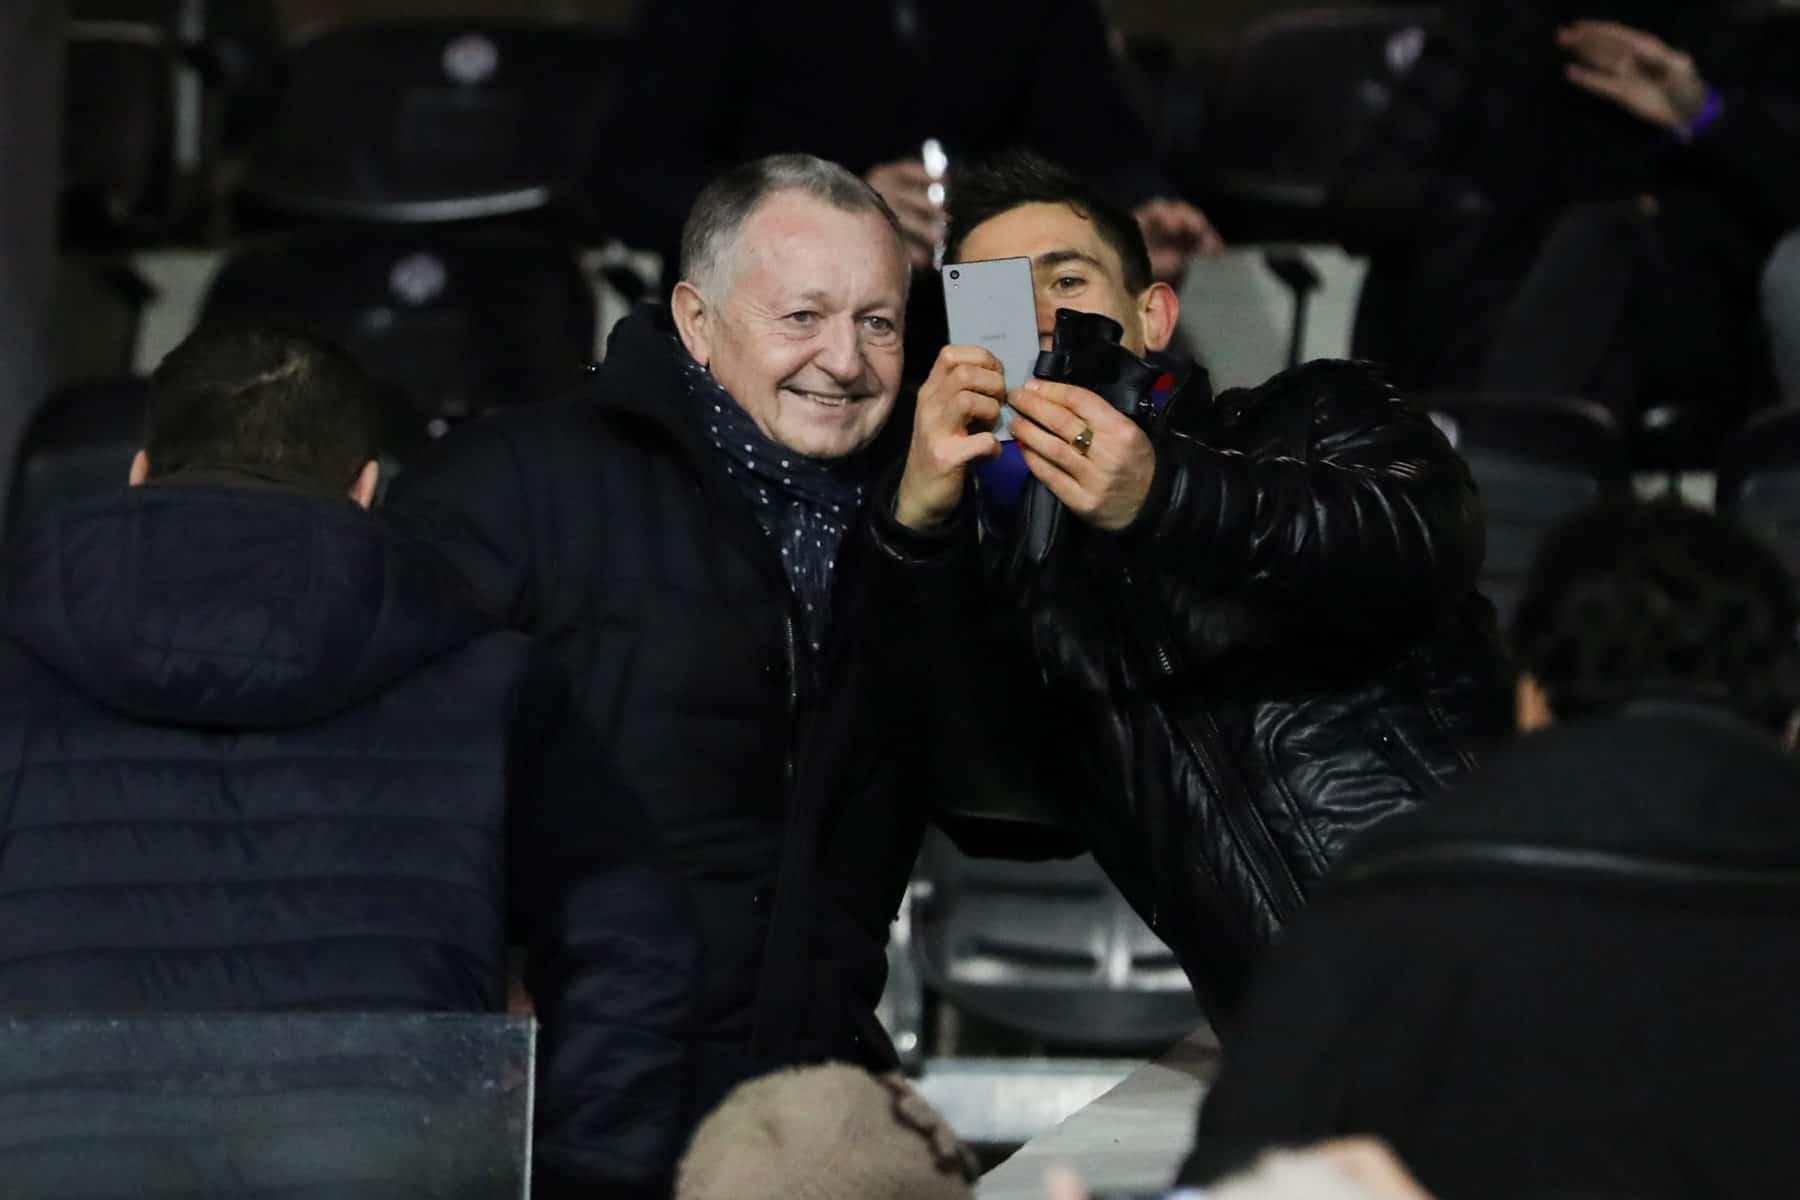 Karl Toko Ekambi (Villarreal) à Lyon contre 20 millions d'euros ?